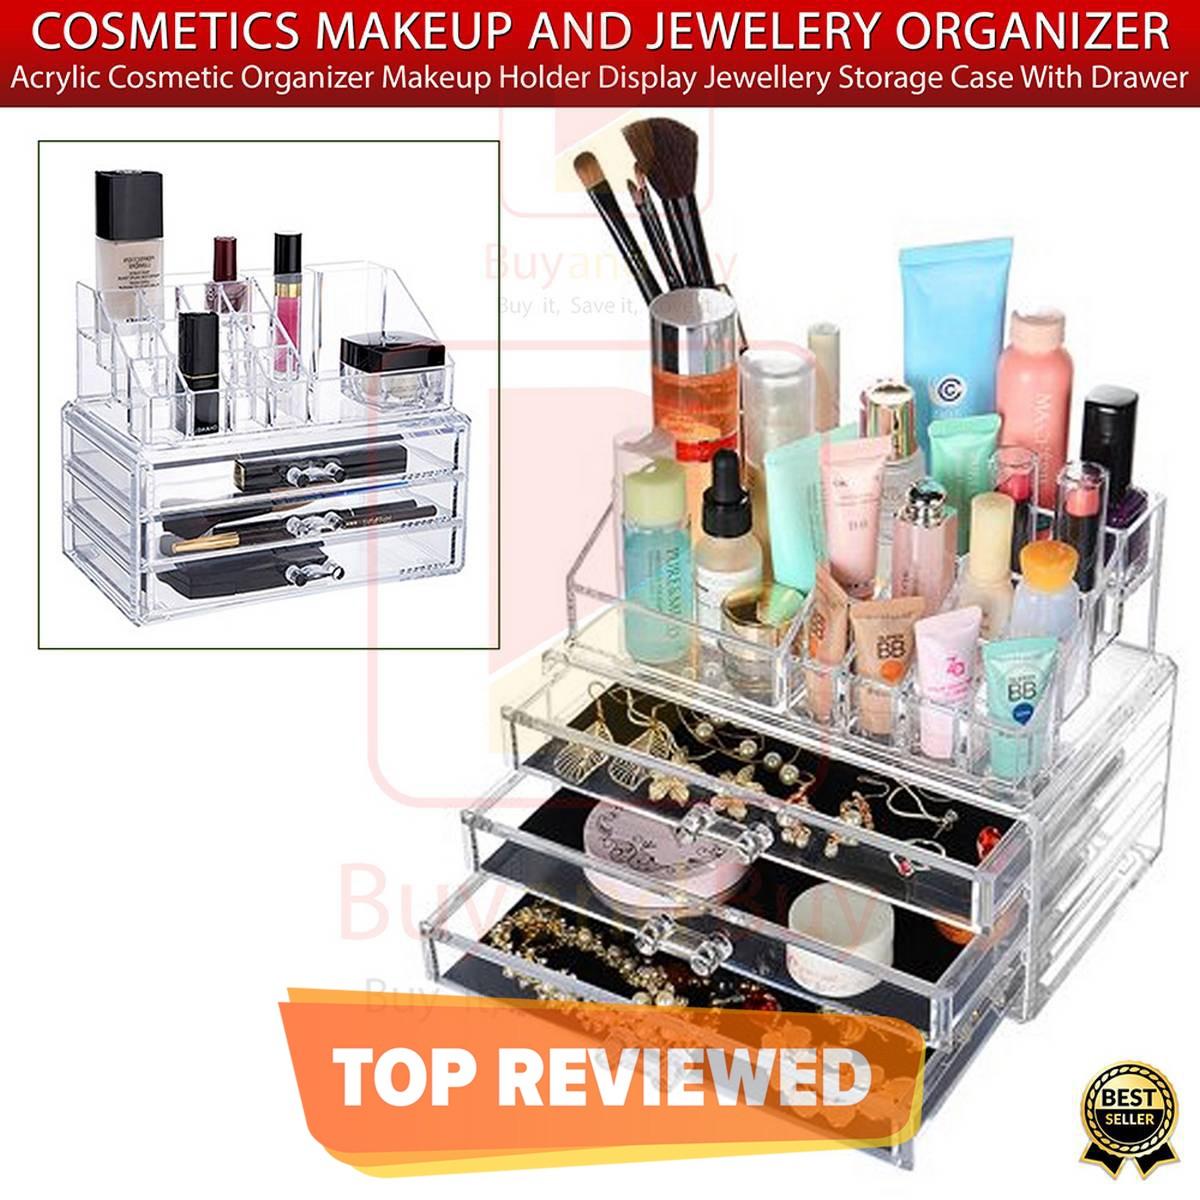 Acrylic 3 Drawers 12 Trapezoid Lipstick Makeup Display Stand Cosmetic Organizer Holder Case jewelry Box Storage